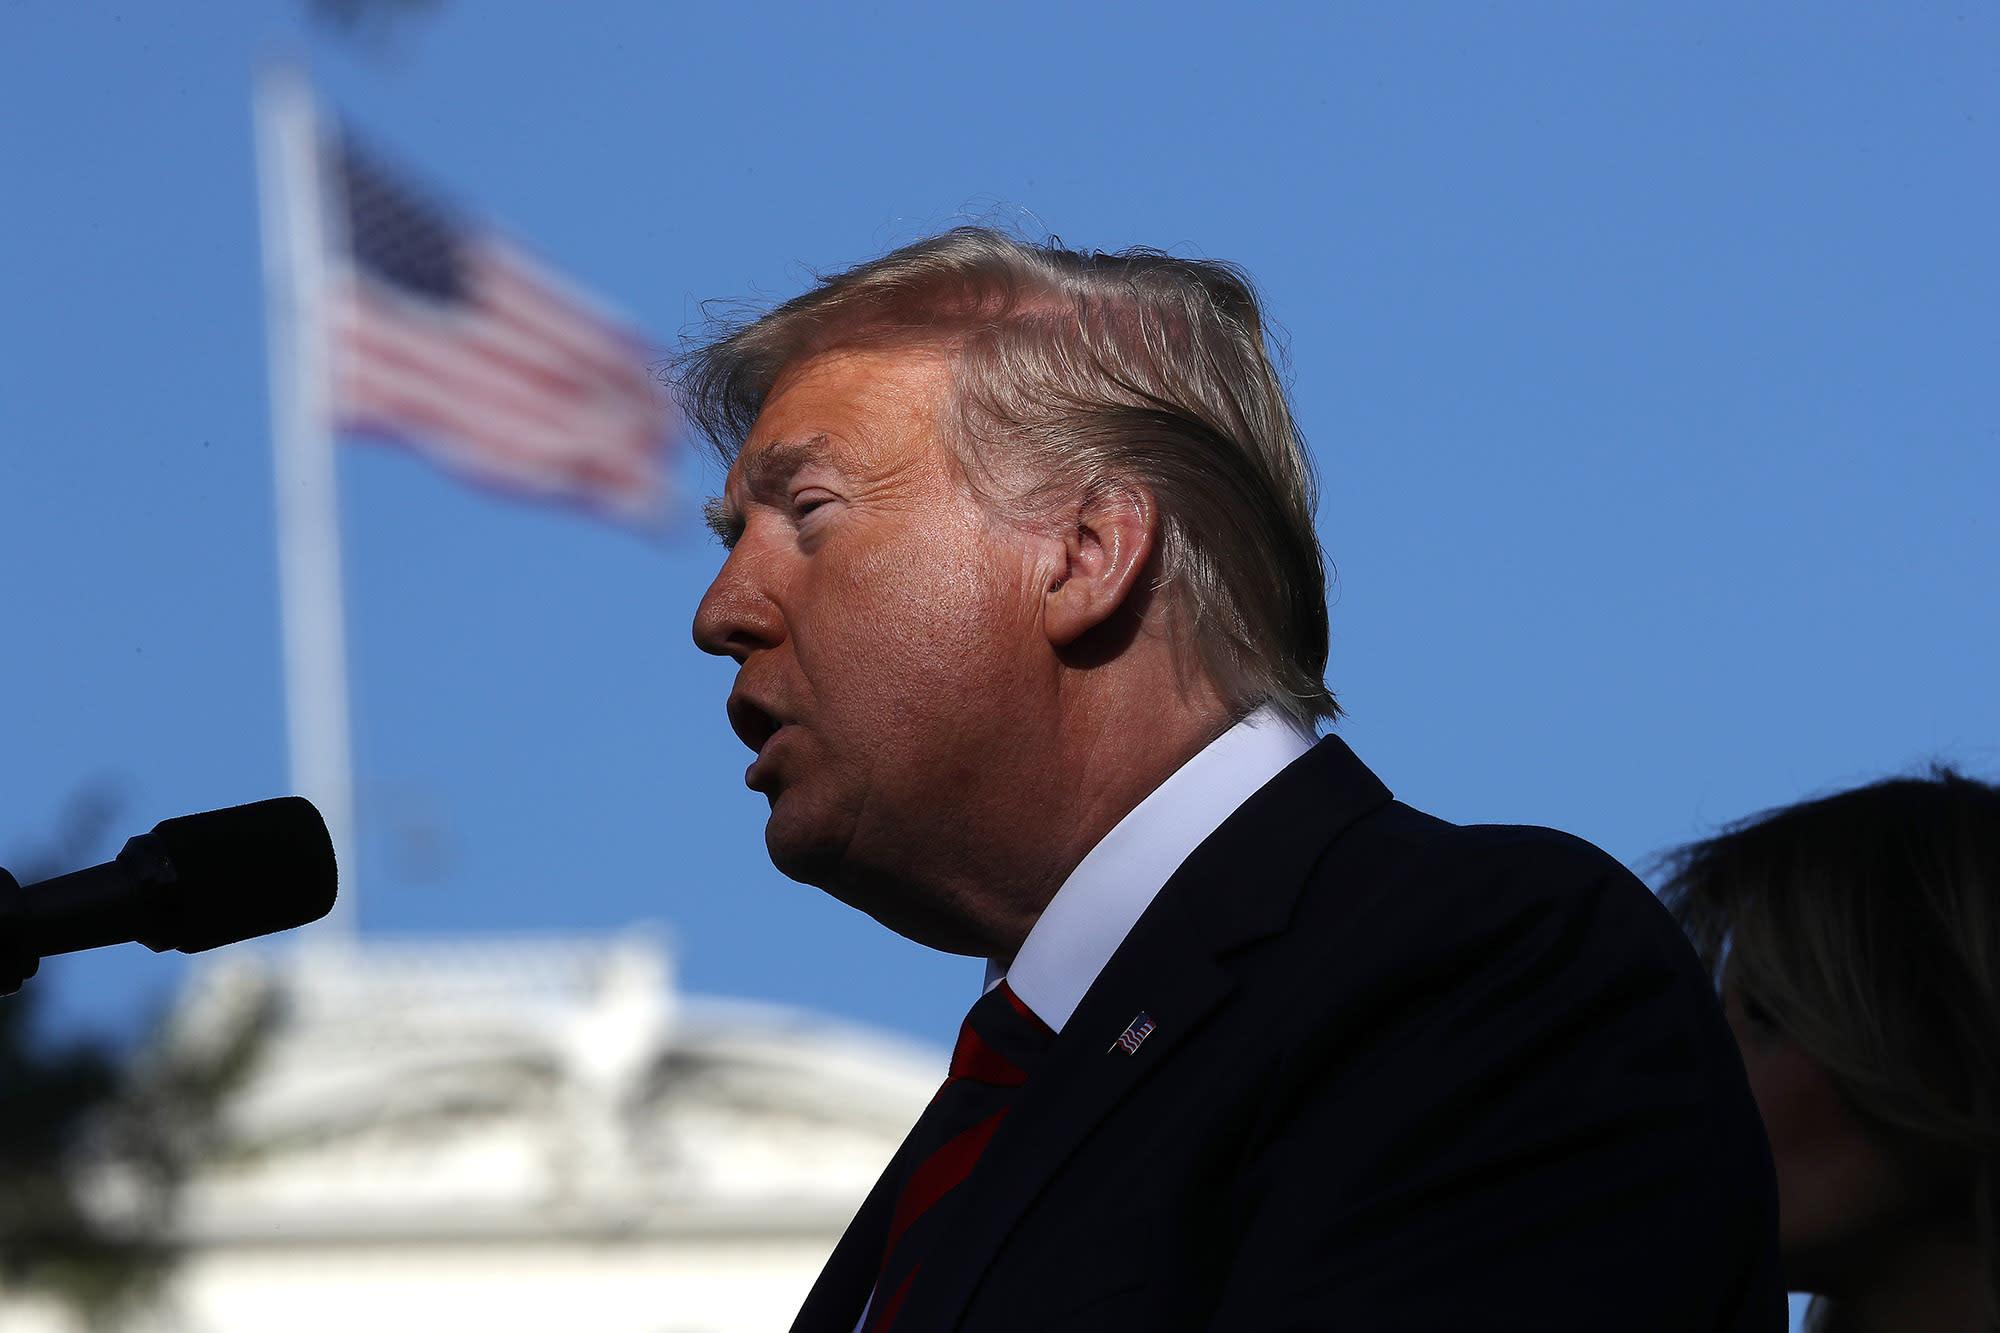 Trade talks stall as China cancels U.S. farm visits